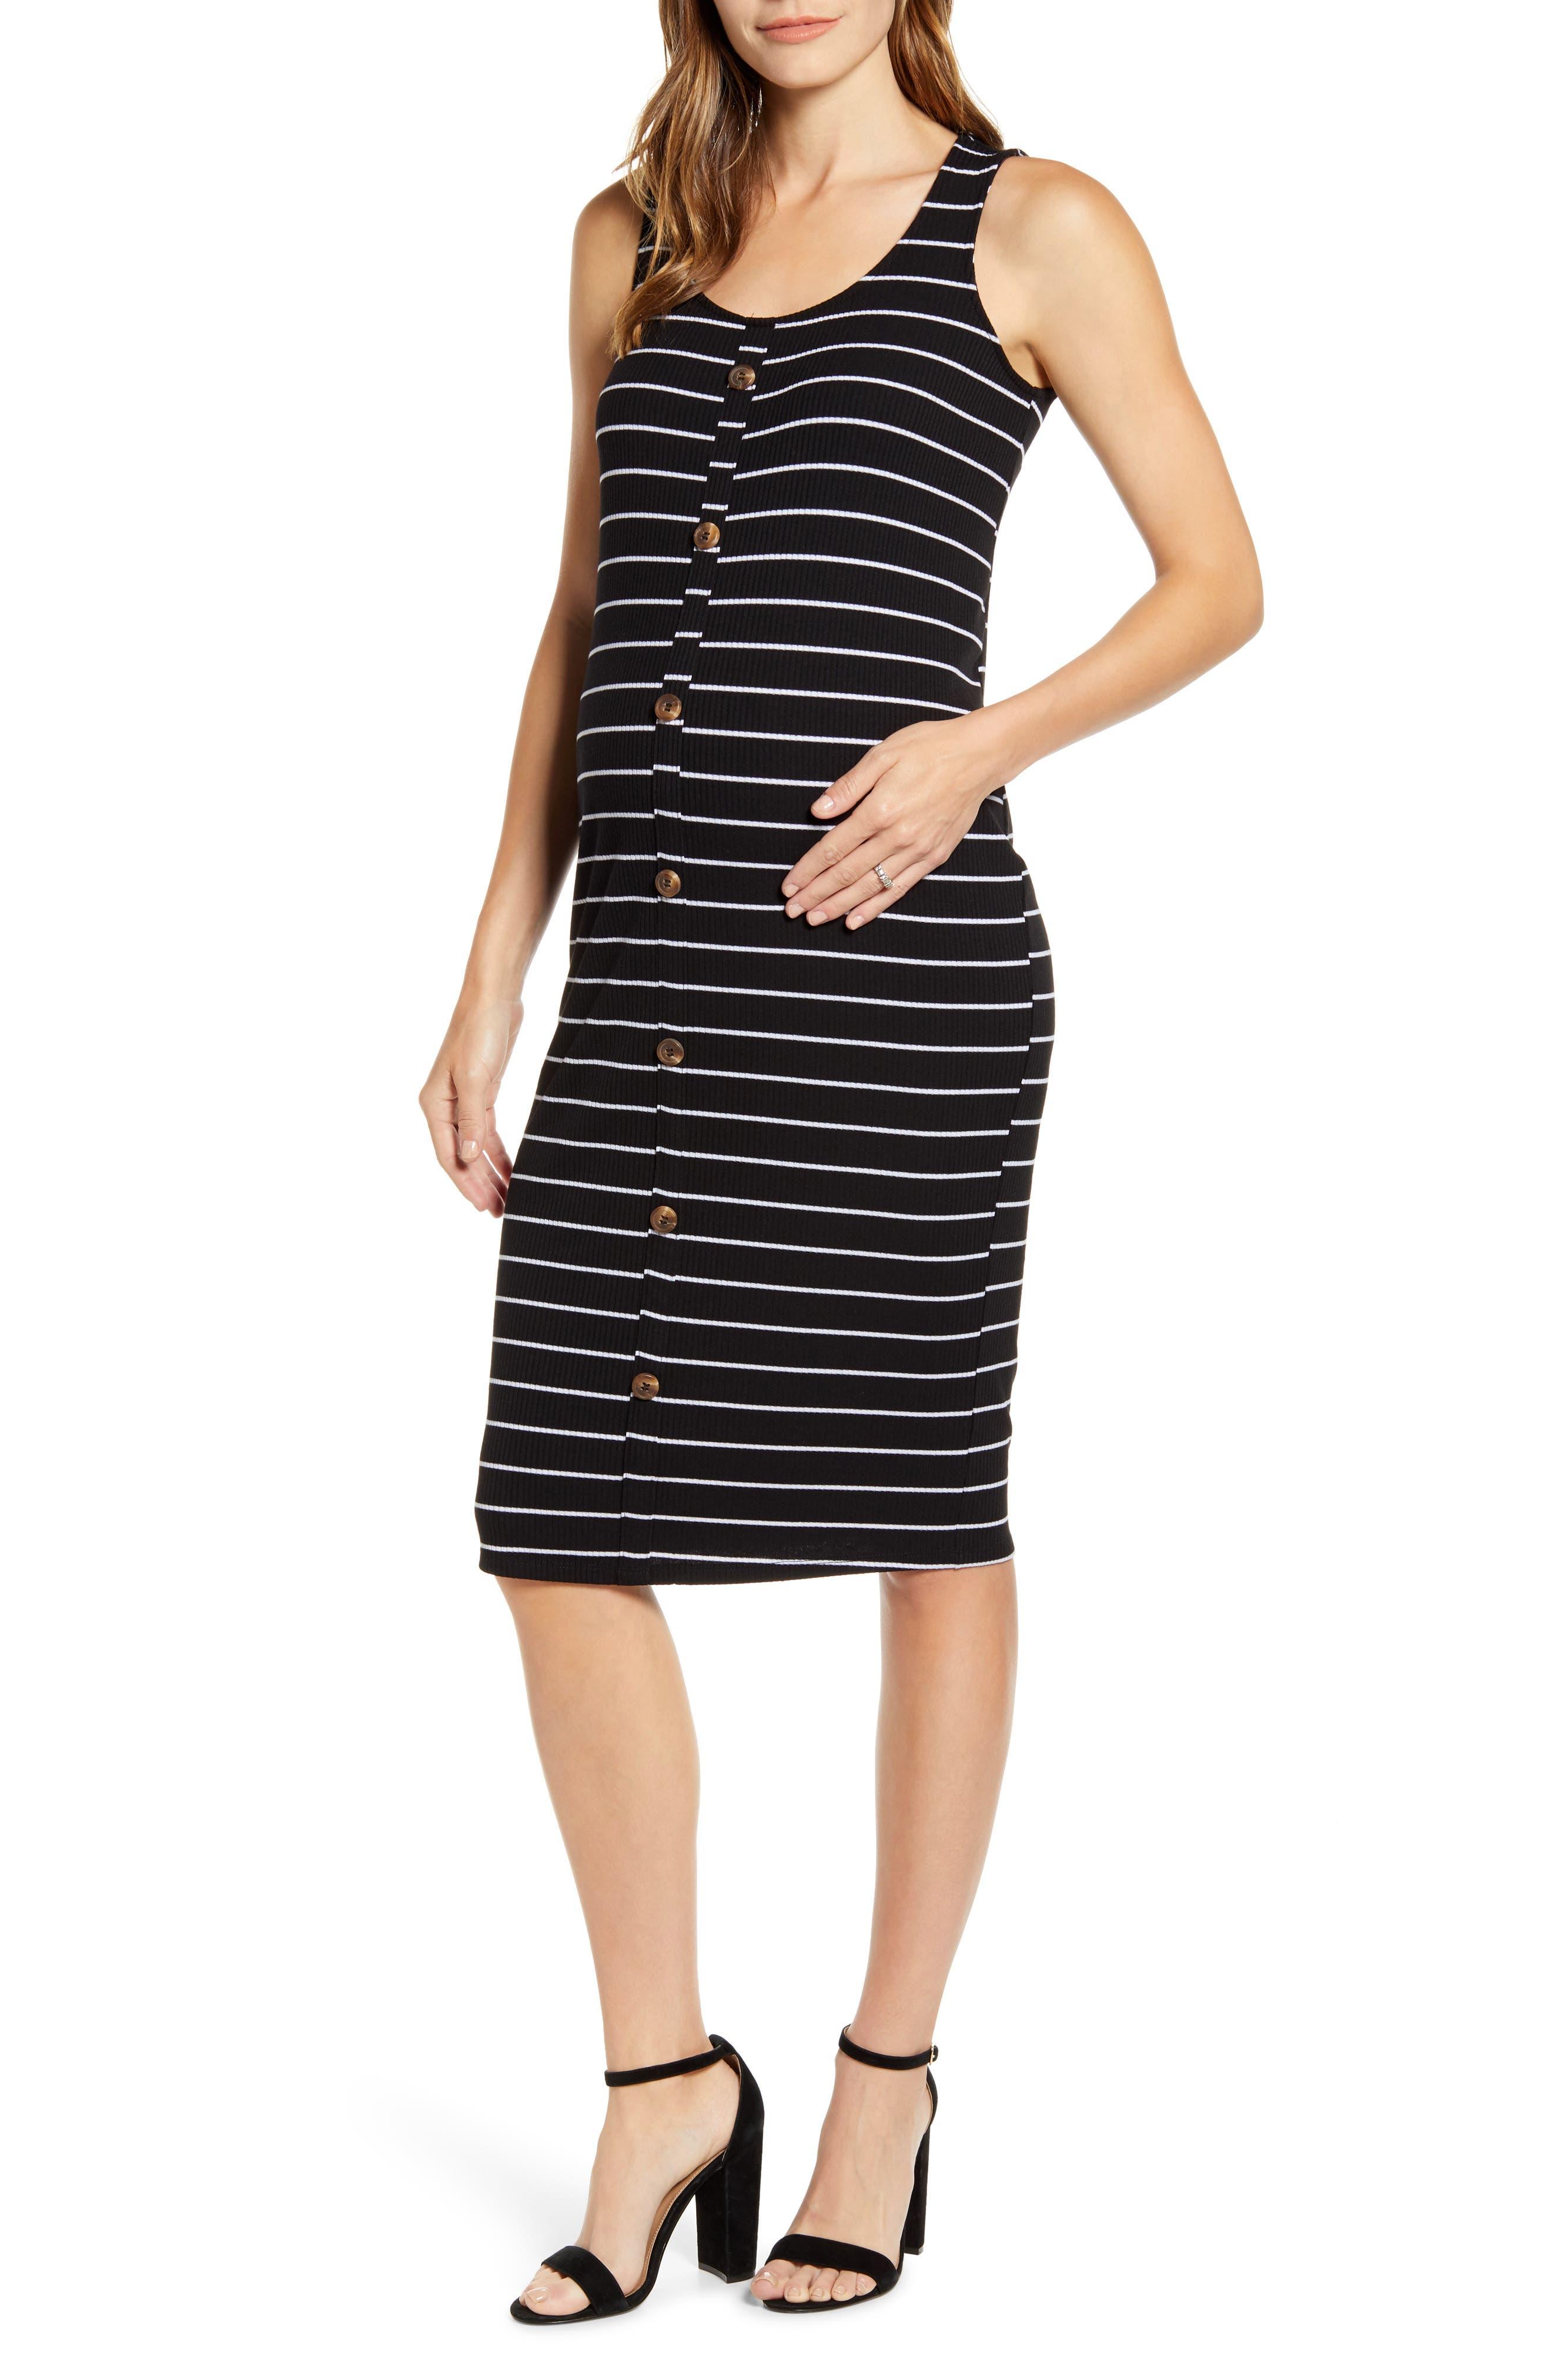 Fourteenth Place Maternity Tank Dress, Black